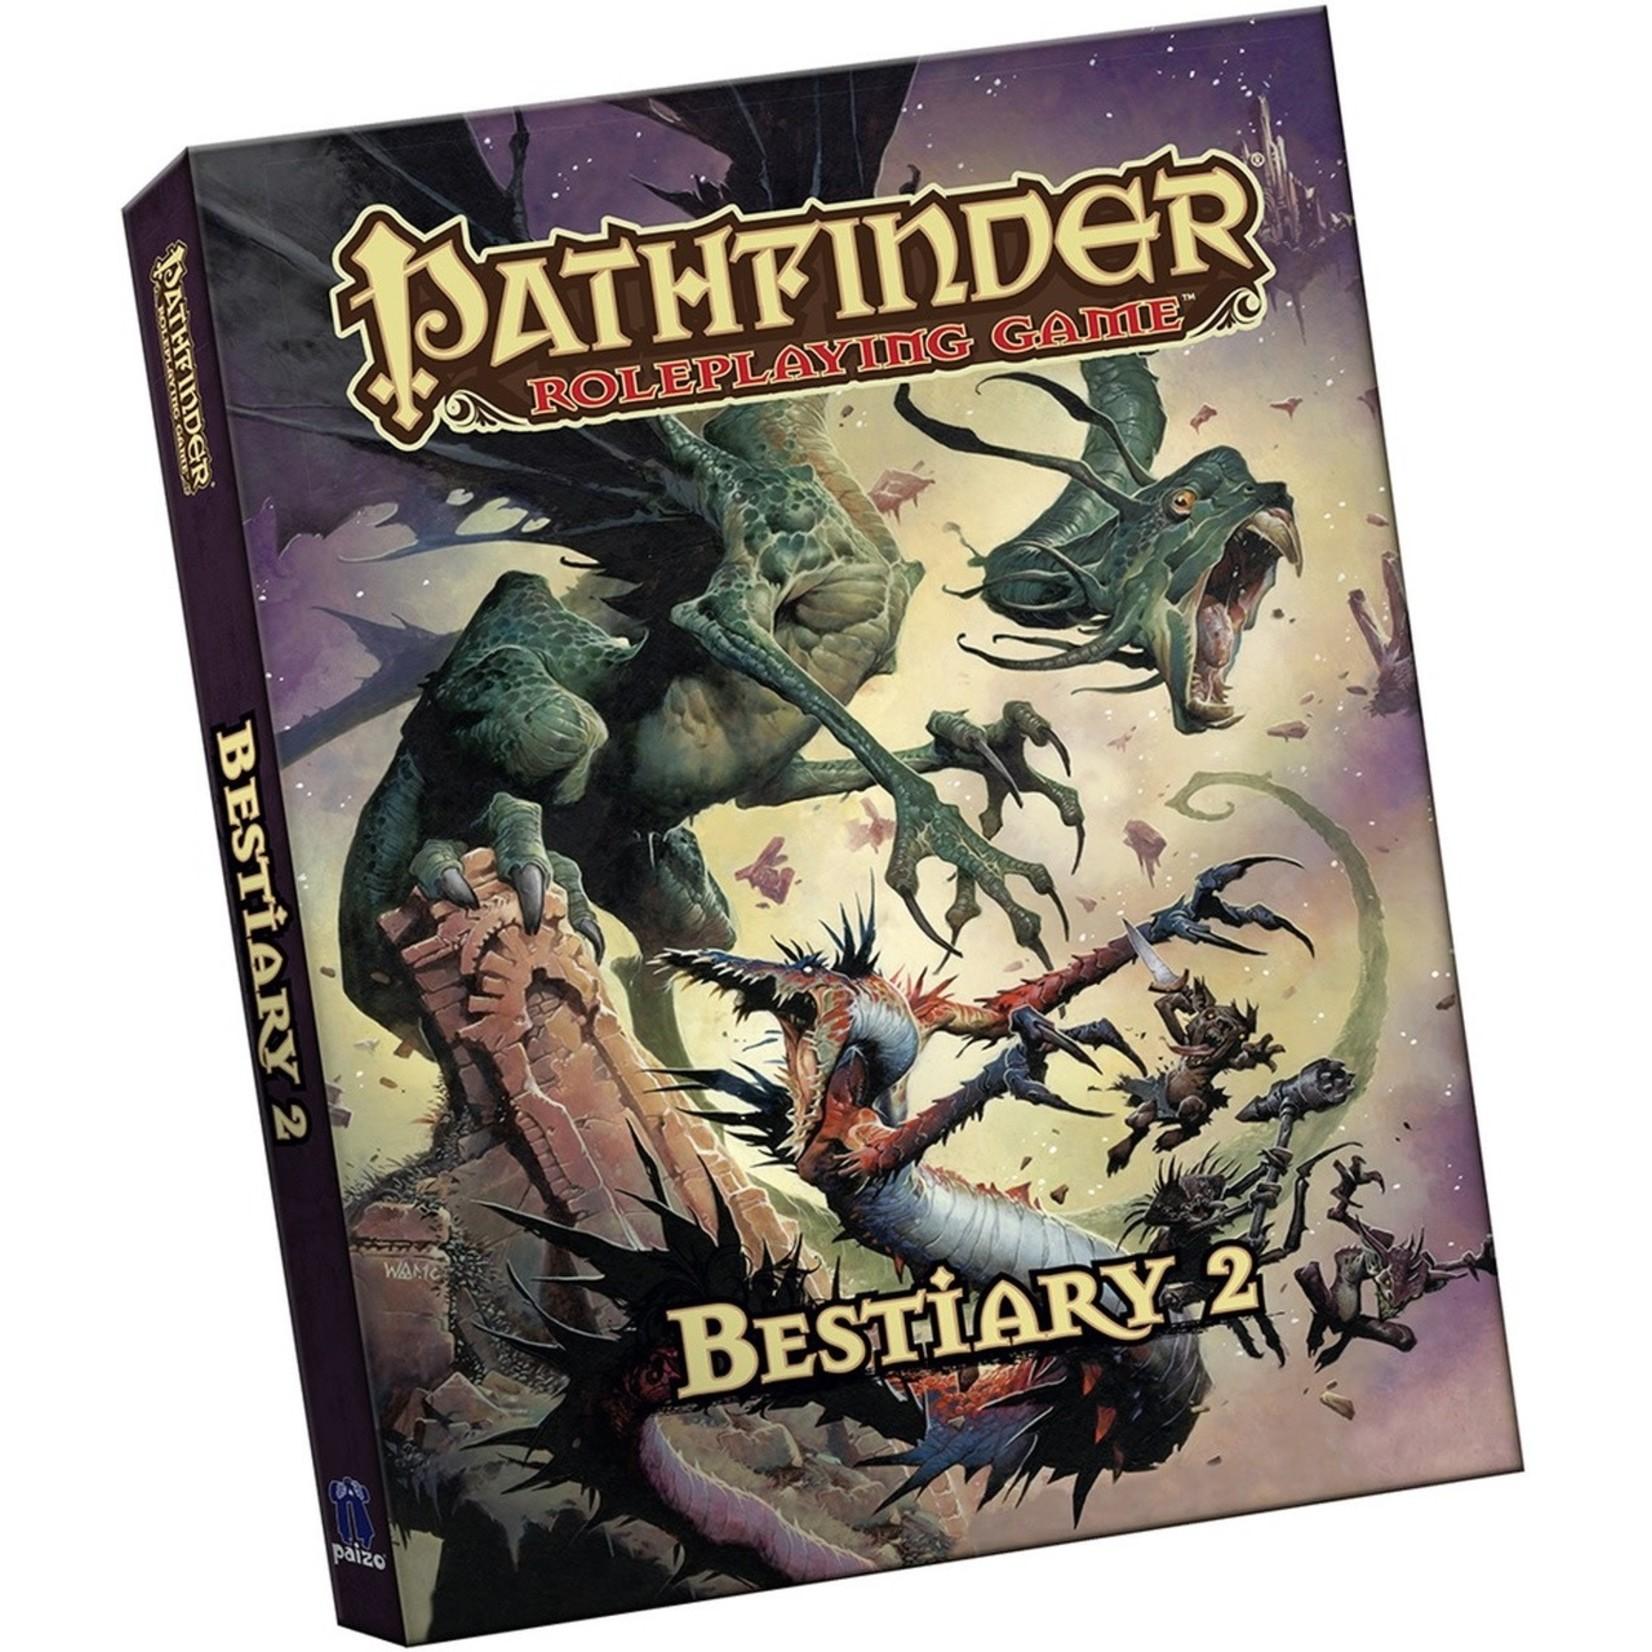 Pathfinder RPG: Bestiary 2 (pocket edition)